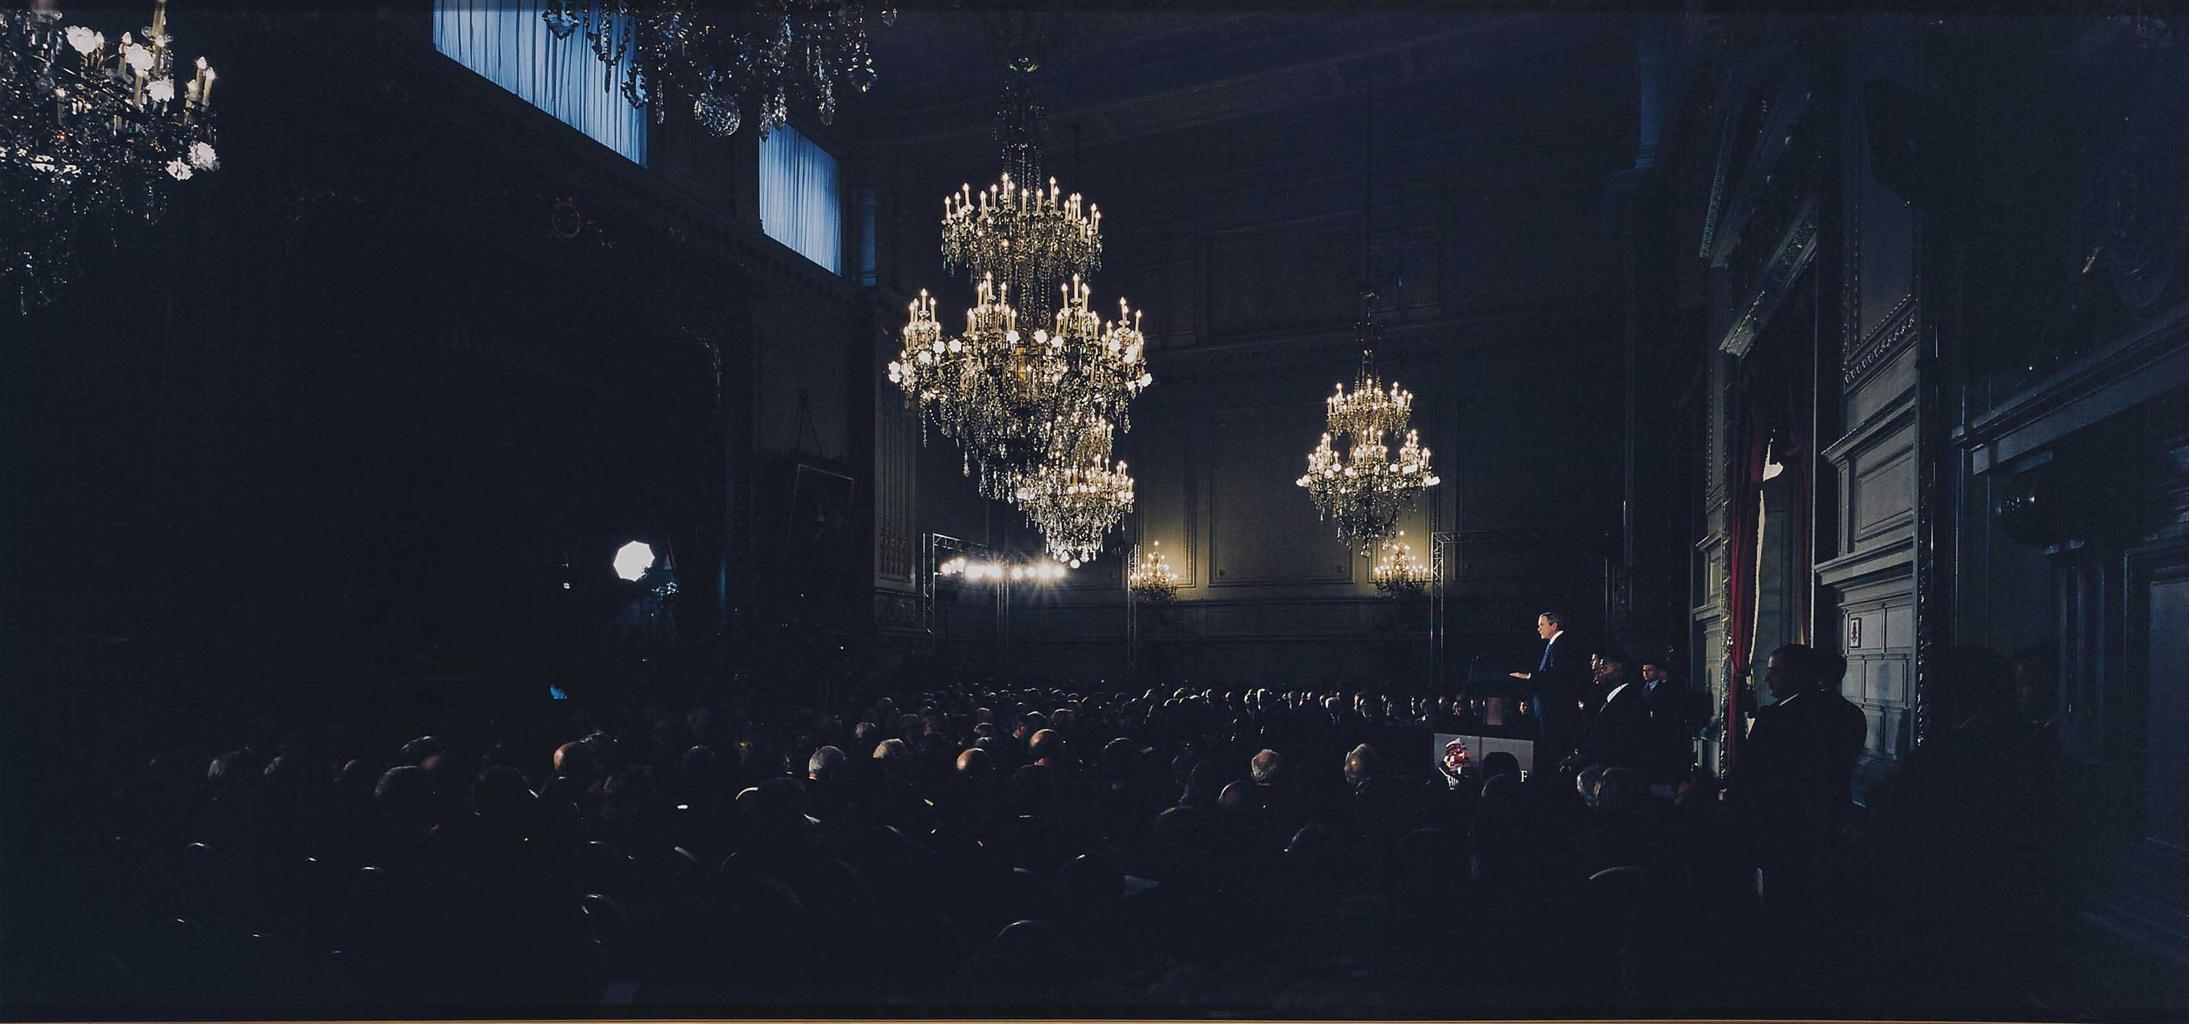 Luc Delahaye-George Bush at Concert Noble-2005